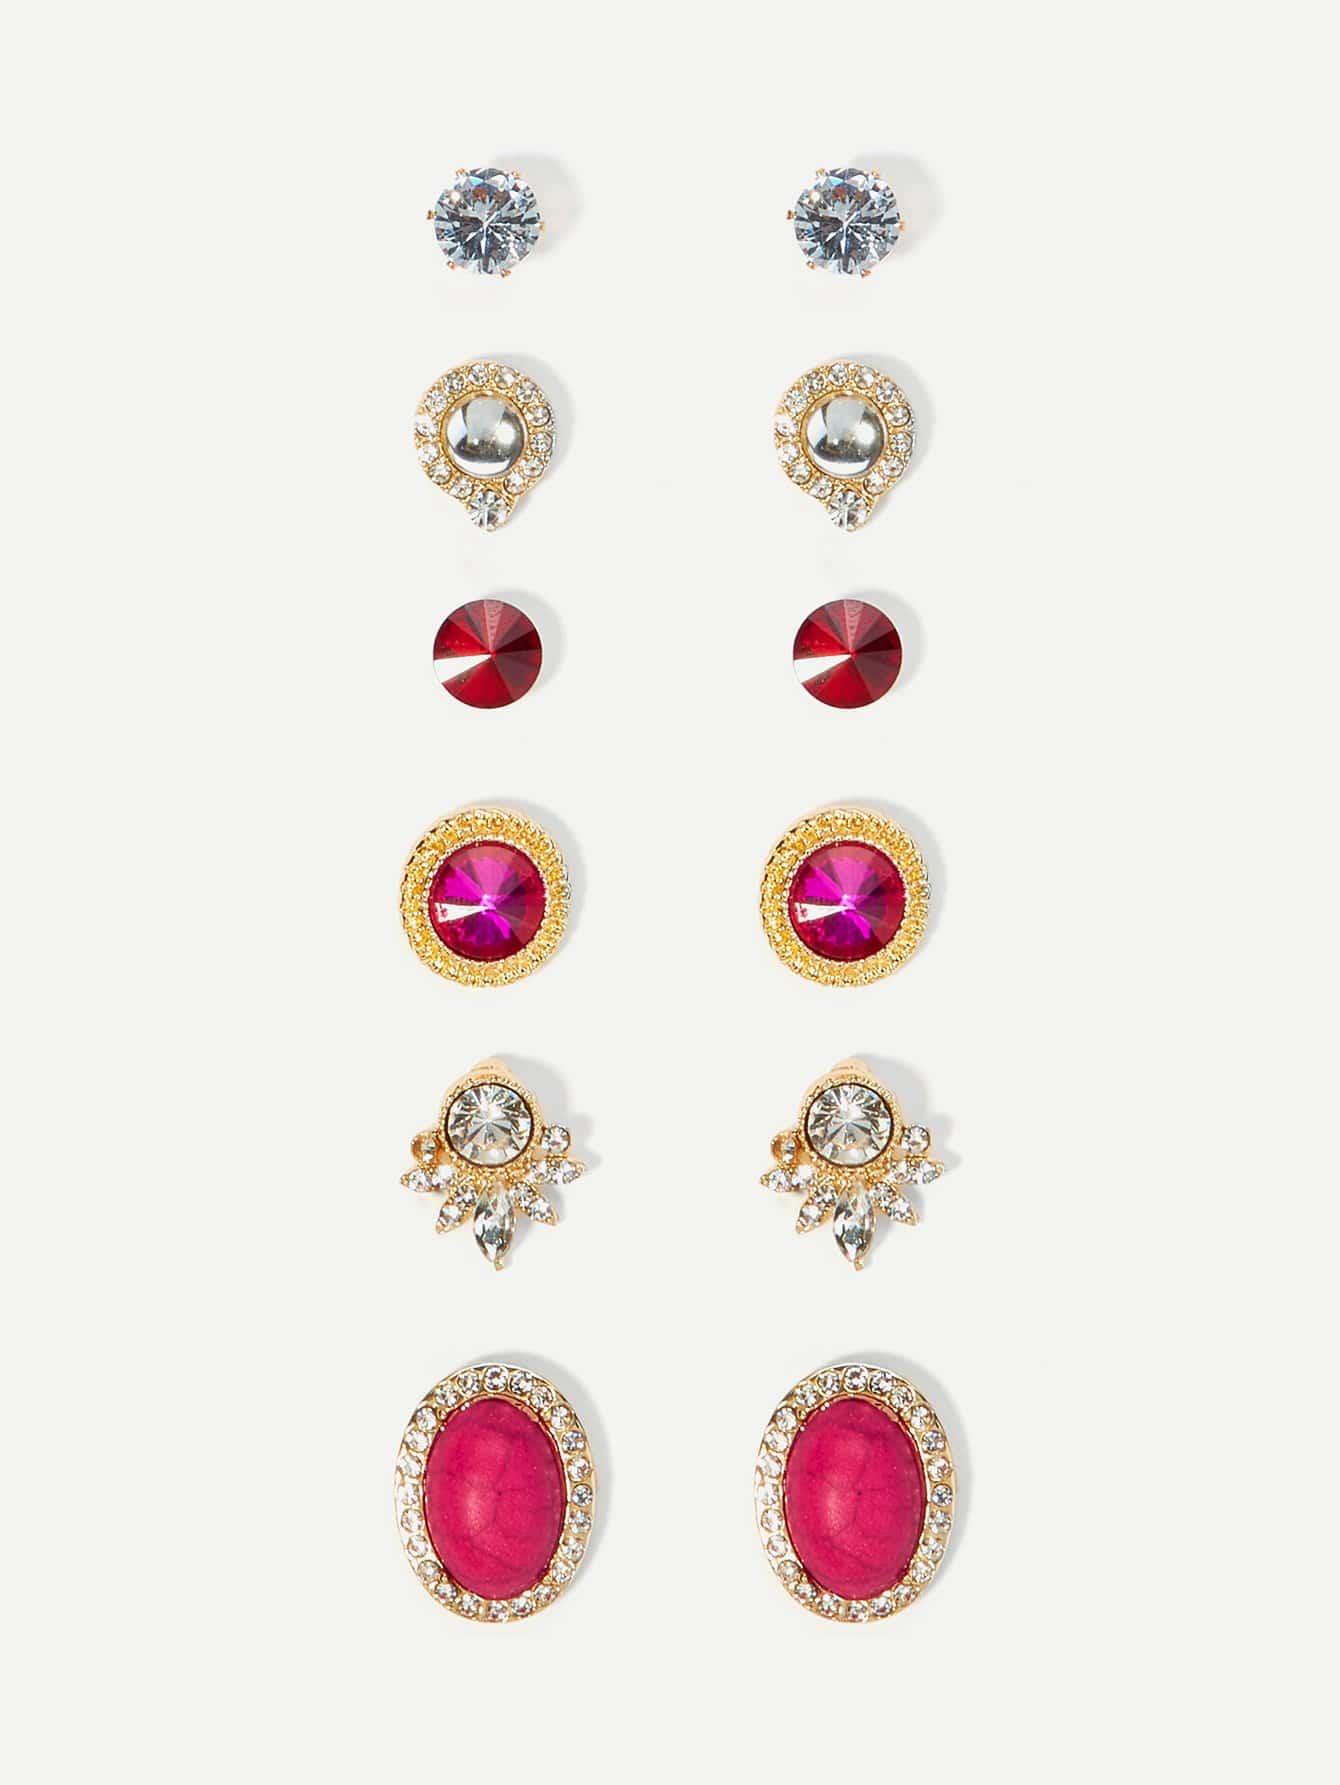 Two Tone Rhinestone Stud Earrings Set 6pairs